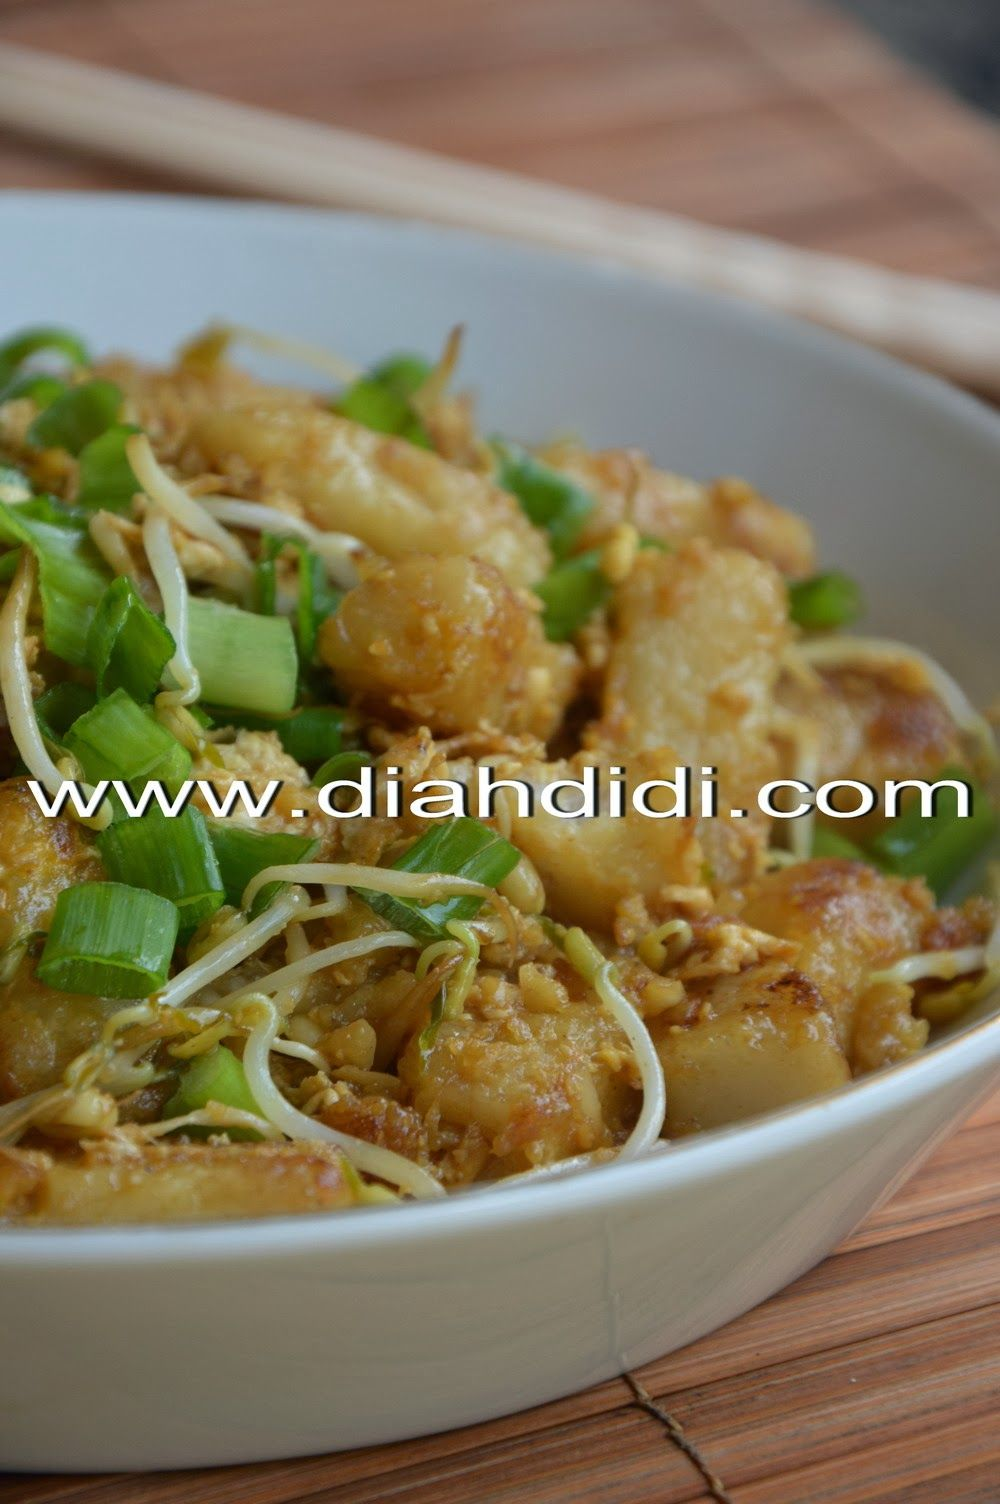 Kue Lobak Goreng Chai Tau Kway Lobak Resep Makanan Masakan